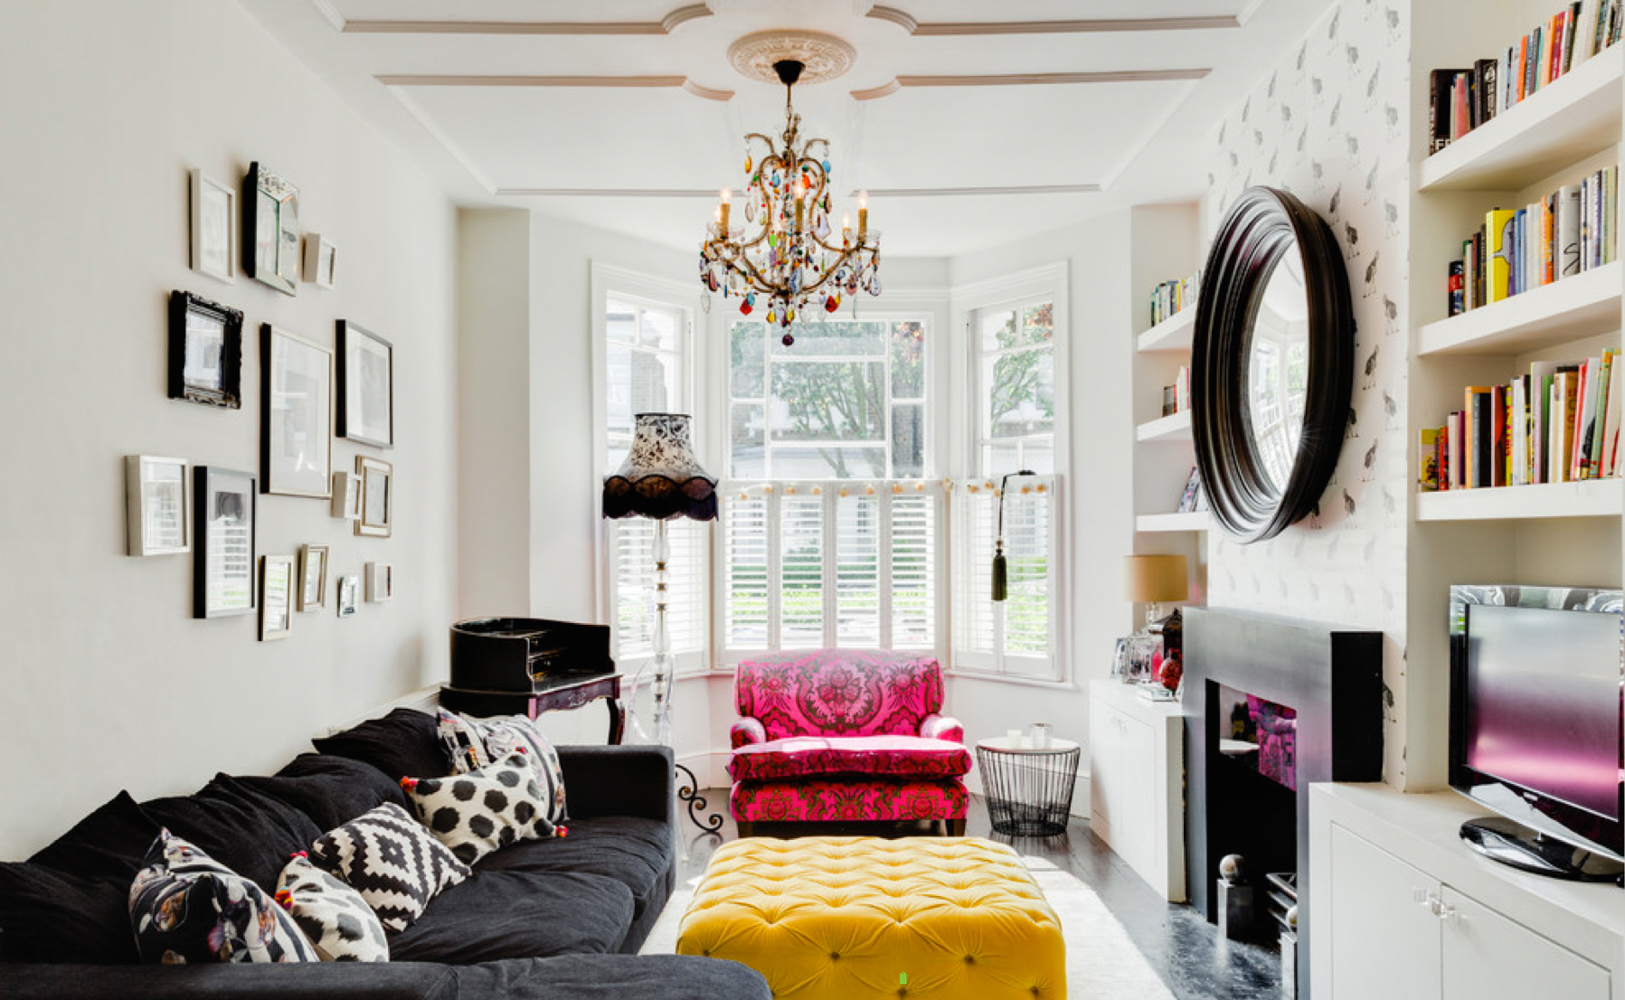 Lola-Black-Grain-Decorative-Convex-Mirror-Honey-Bee-Interiors_